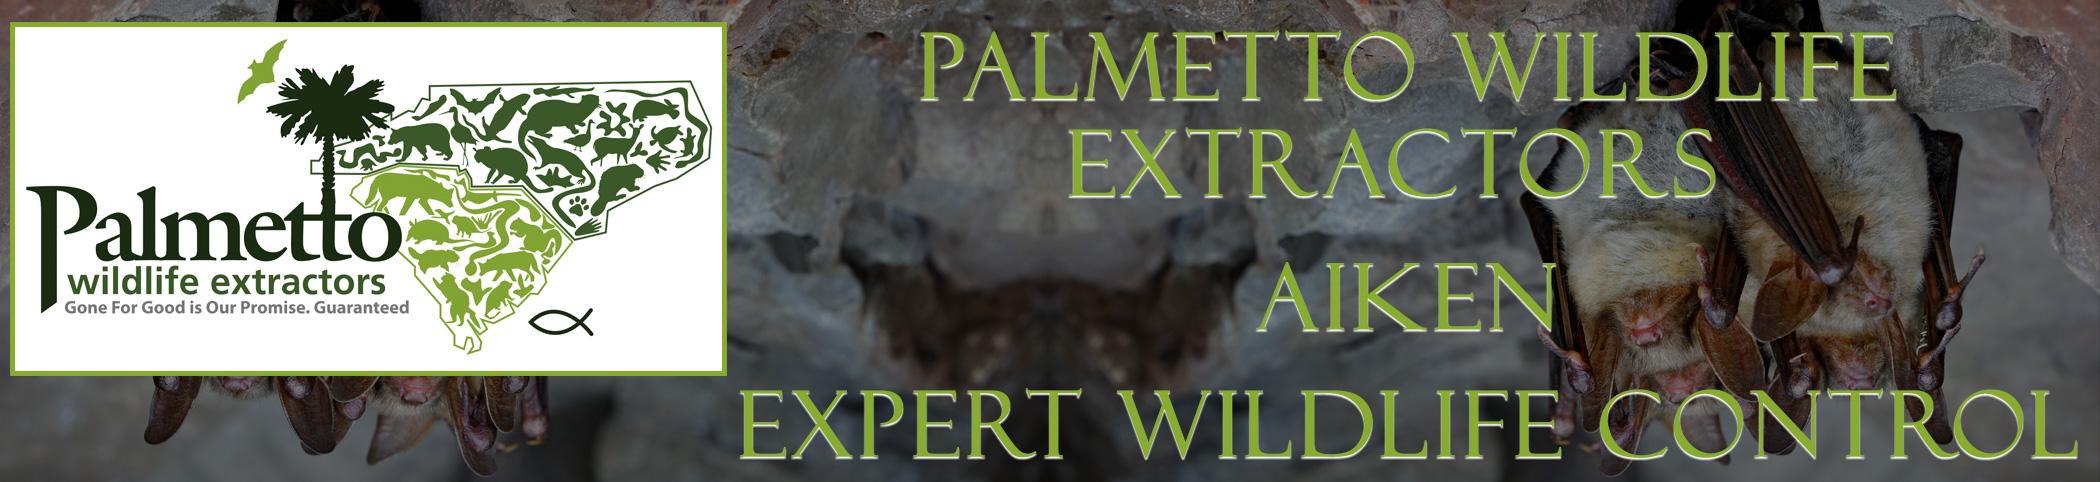 Palmetto Wildlife Extractors aiken south carolina header image